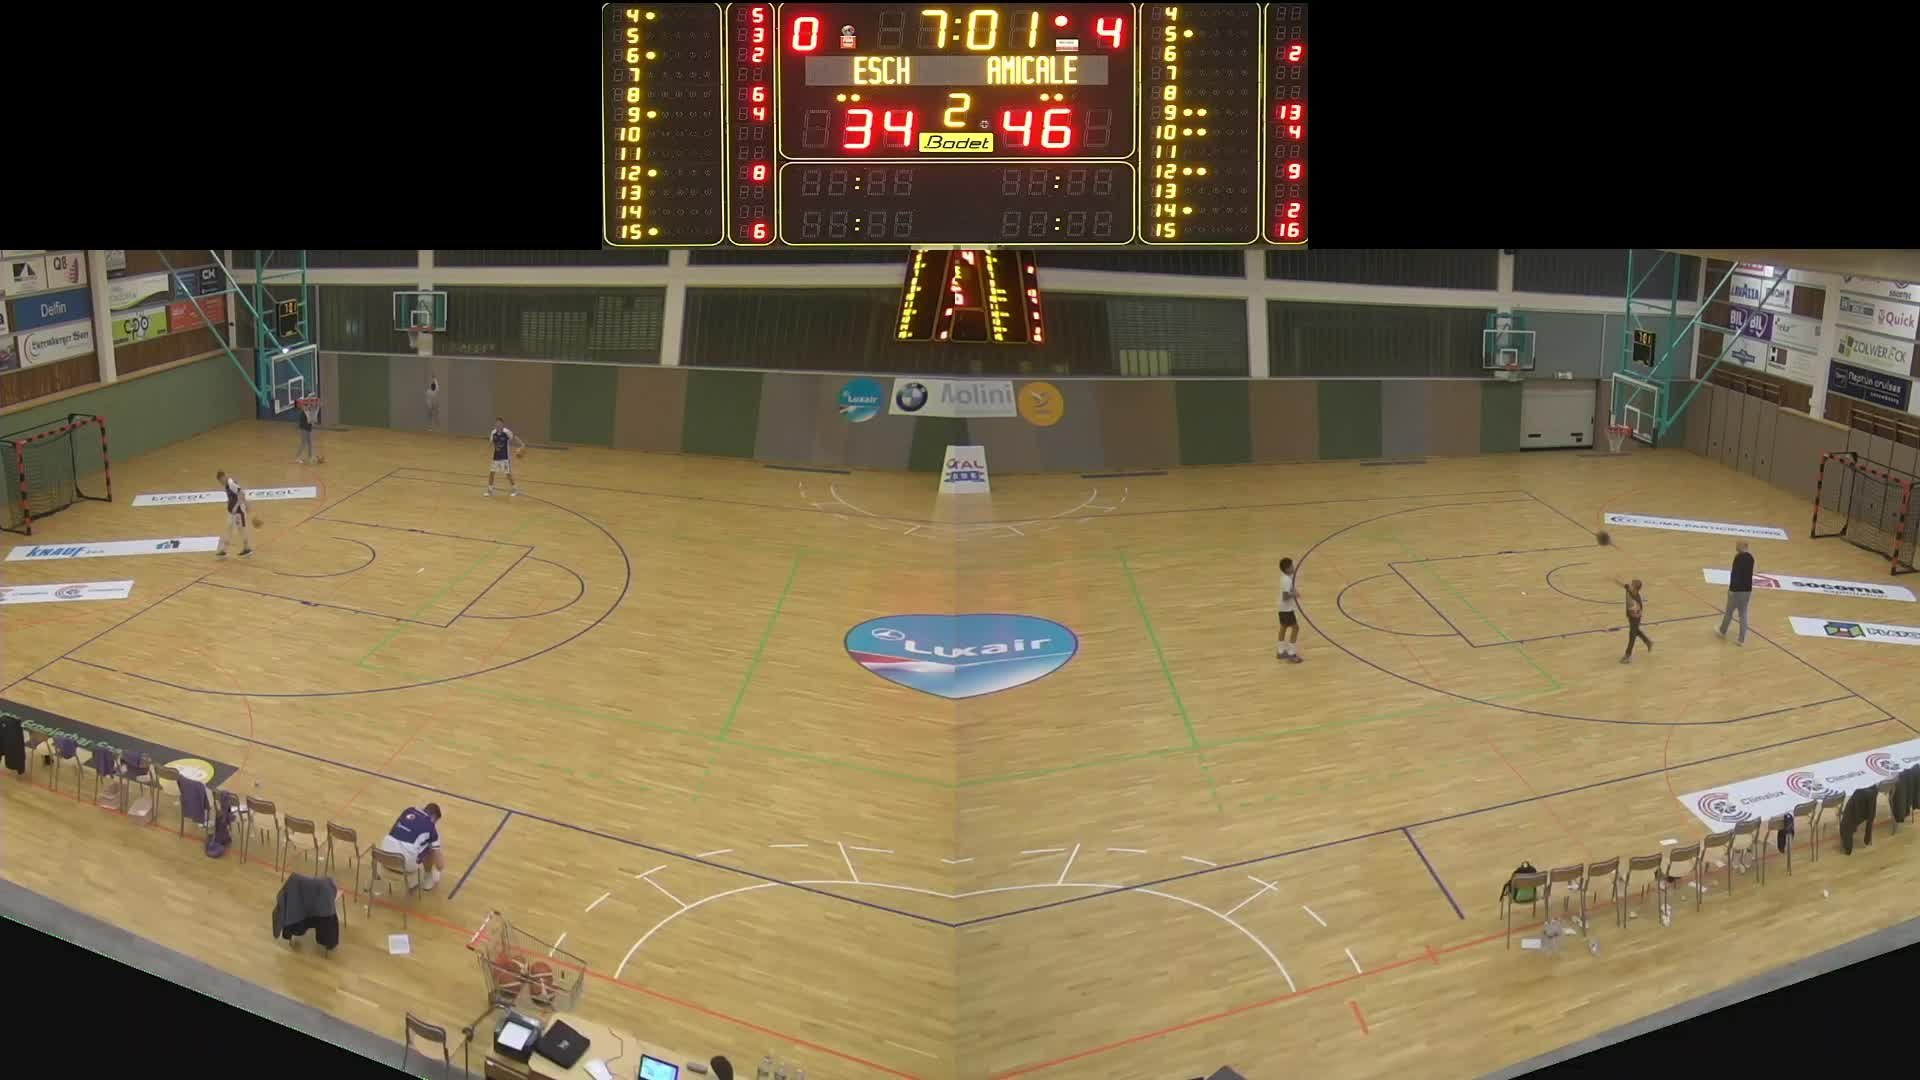 Basket Esch ( Dames A ) - Amicale - 26.10.2019